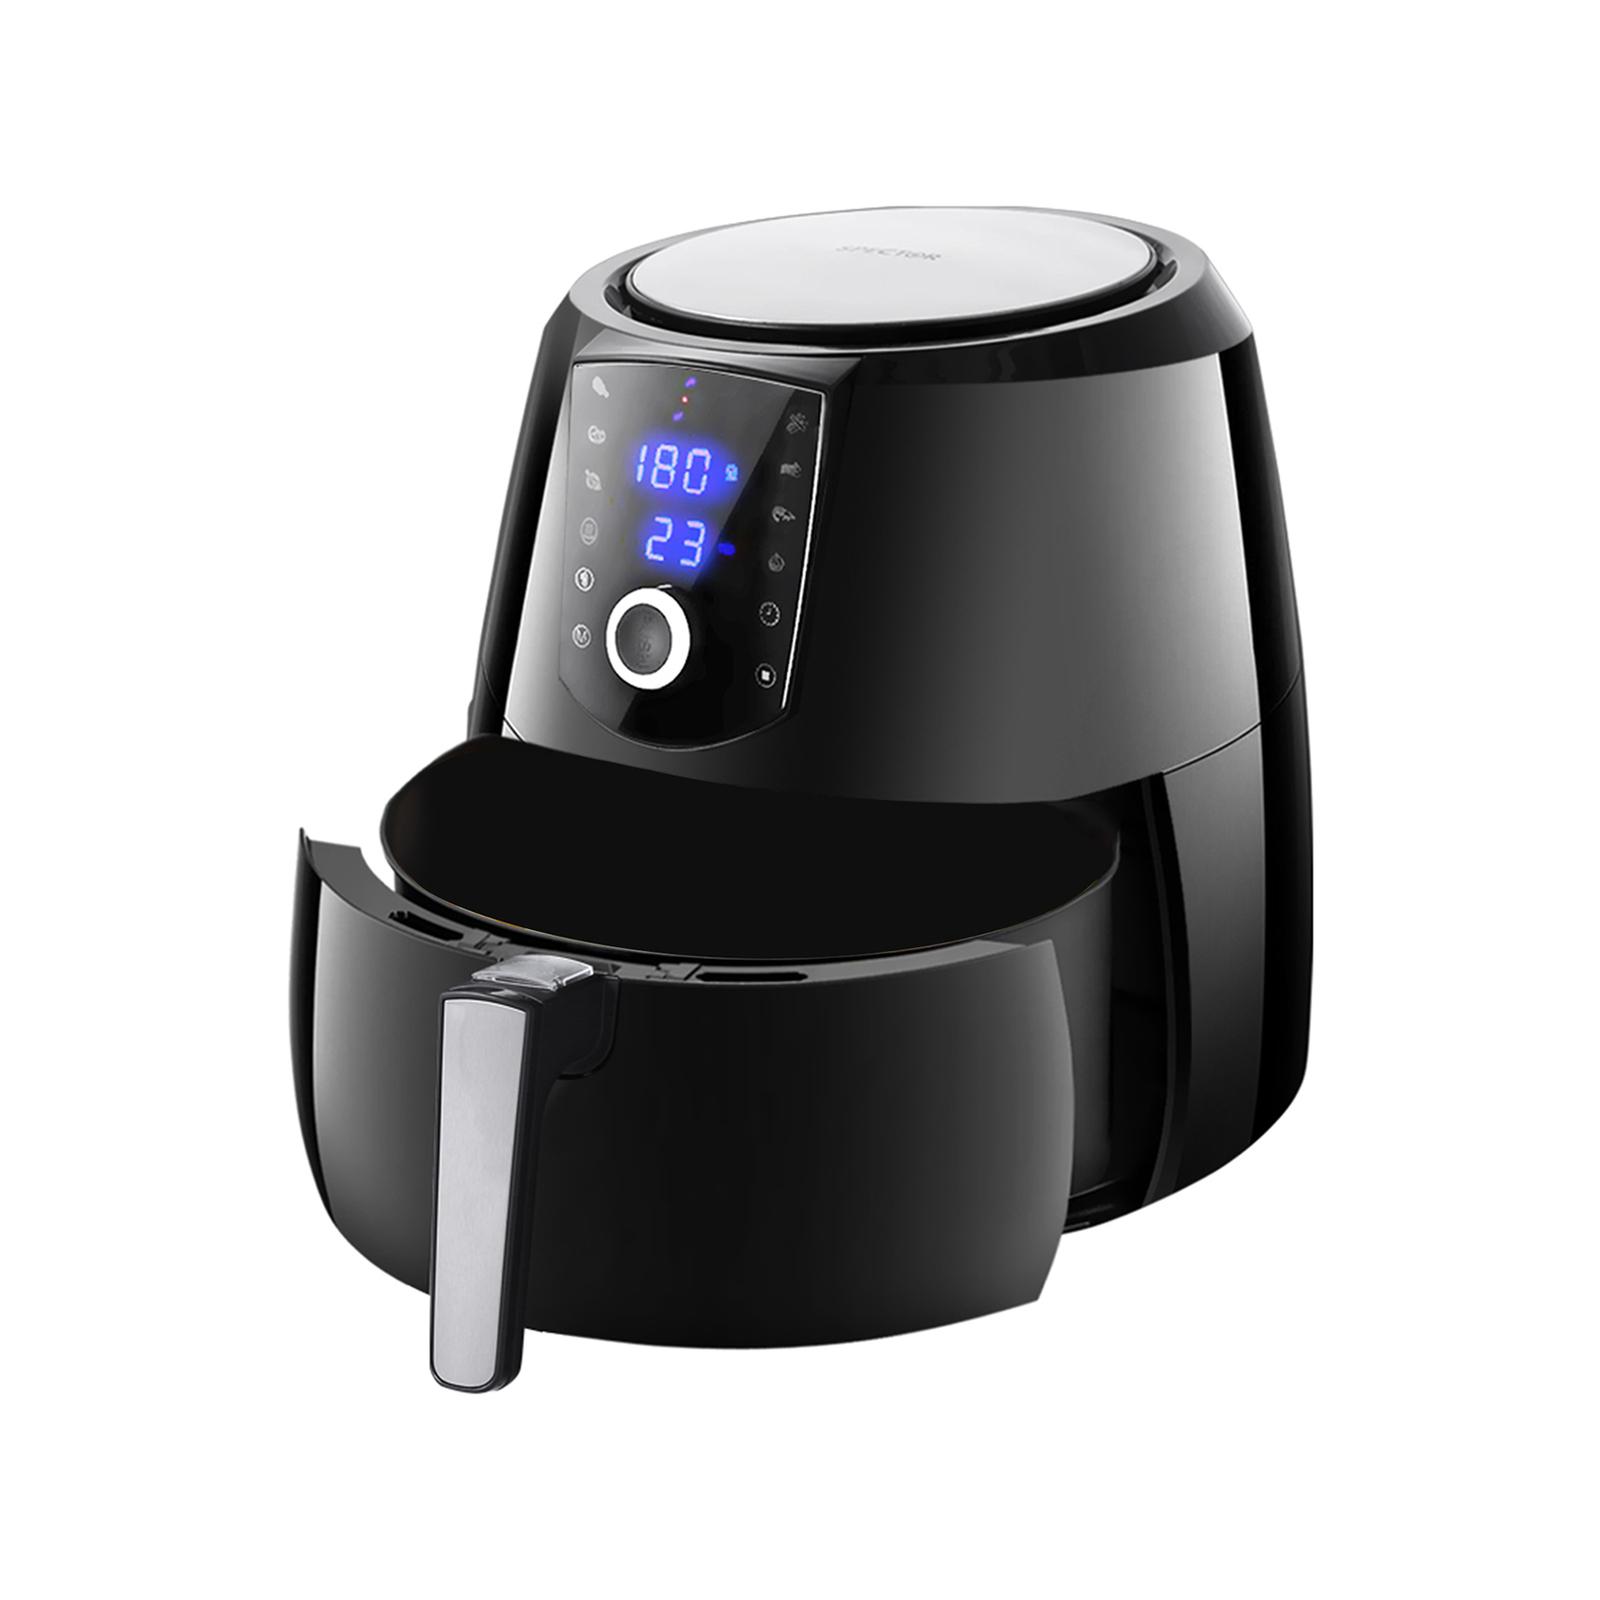 Spector 7L Black Air Fryer LCD Cooker Deep Fryers Oven Oil Free Low Fat Healthy